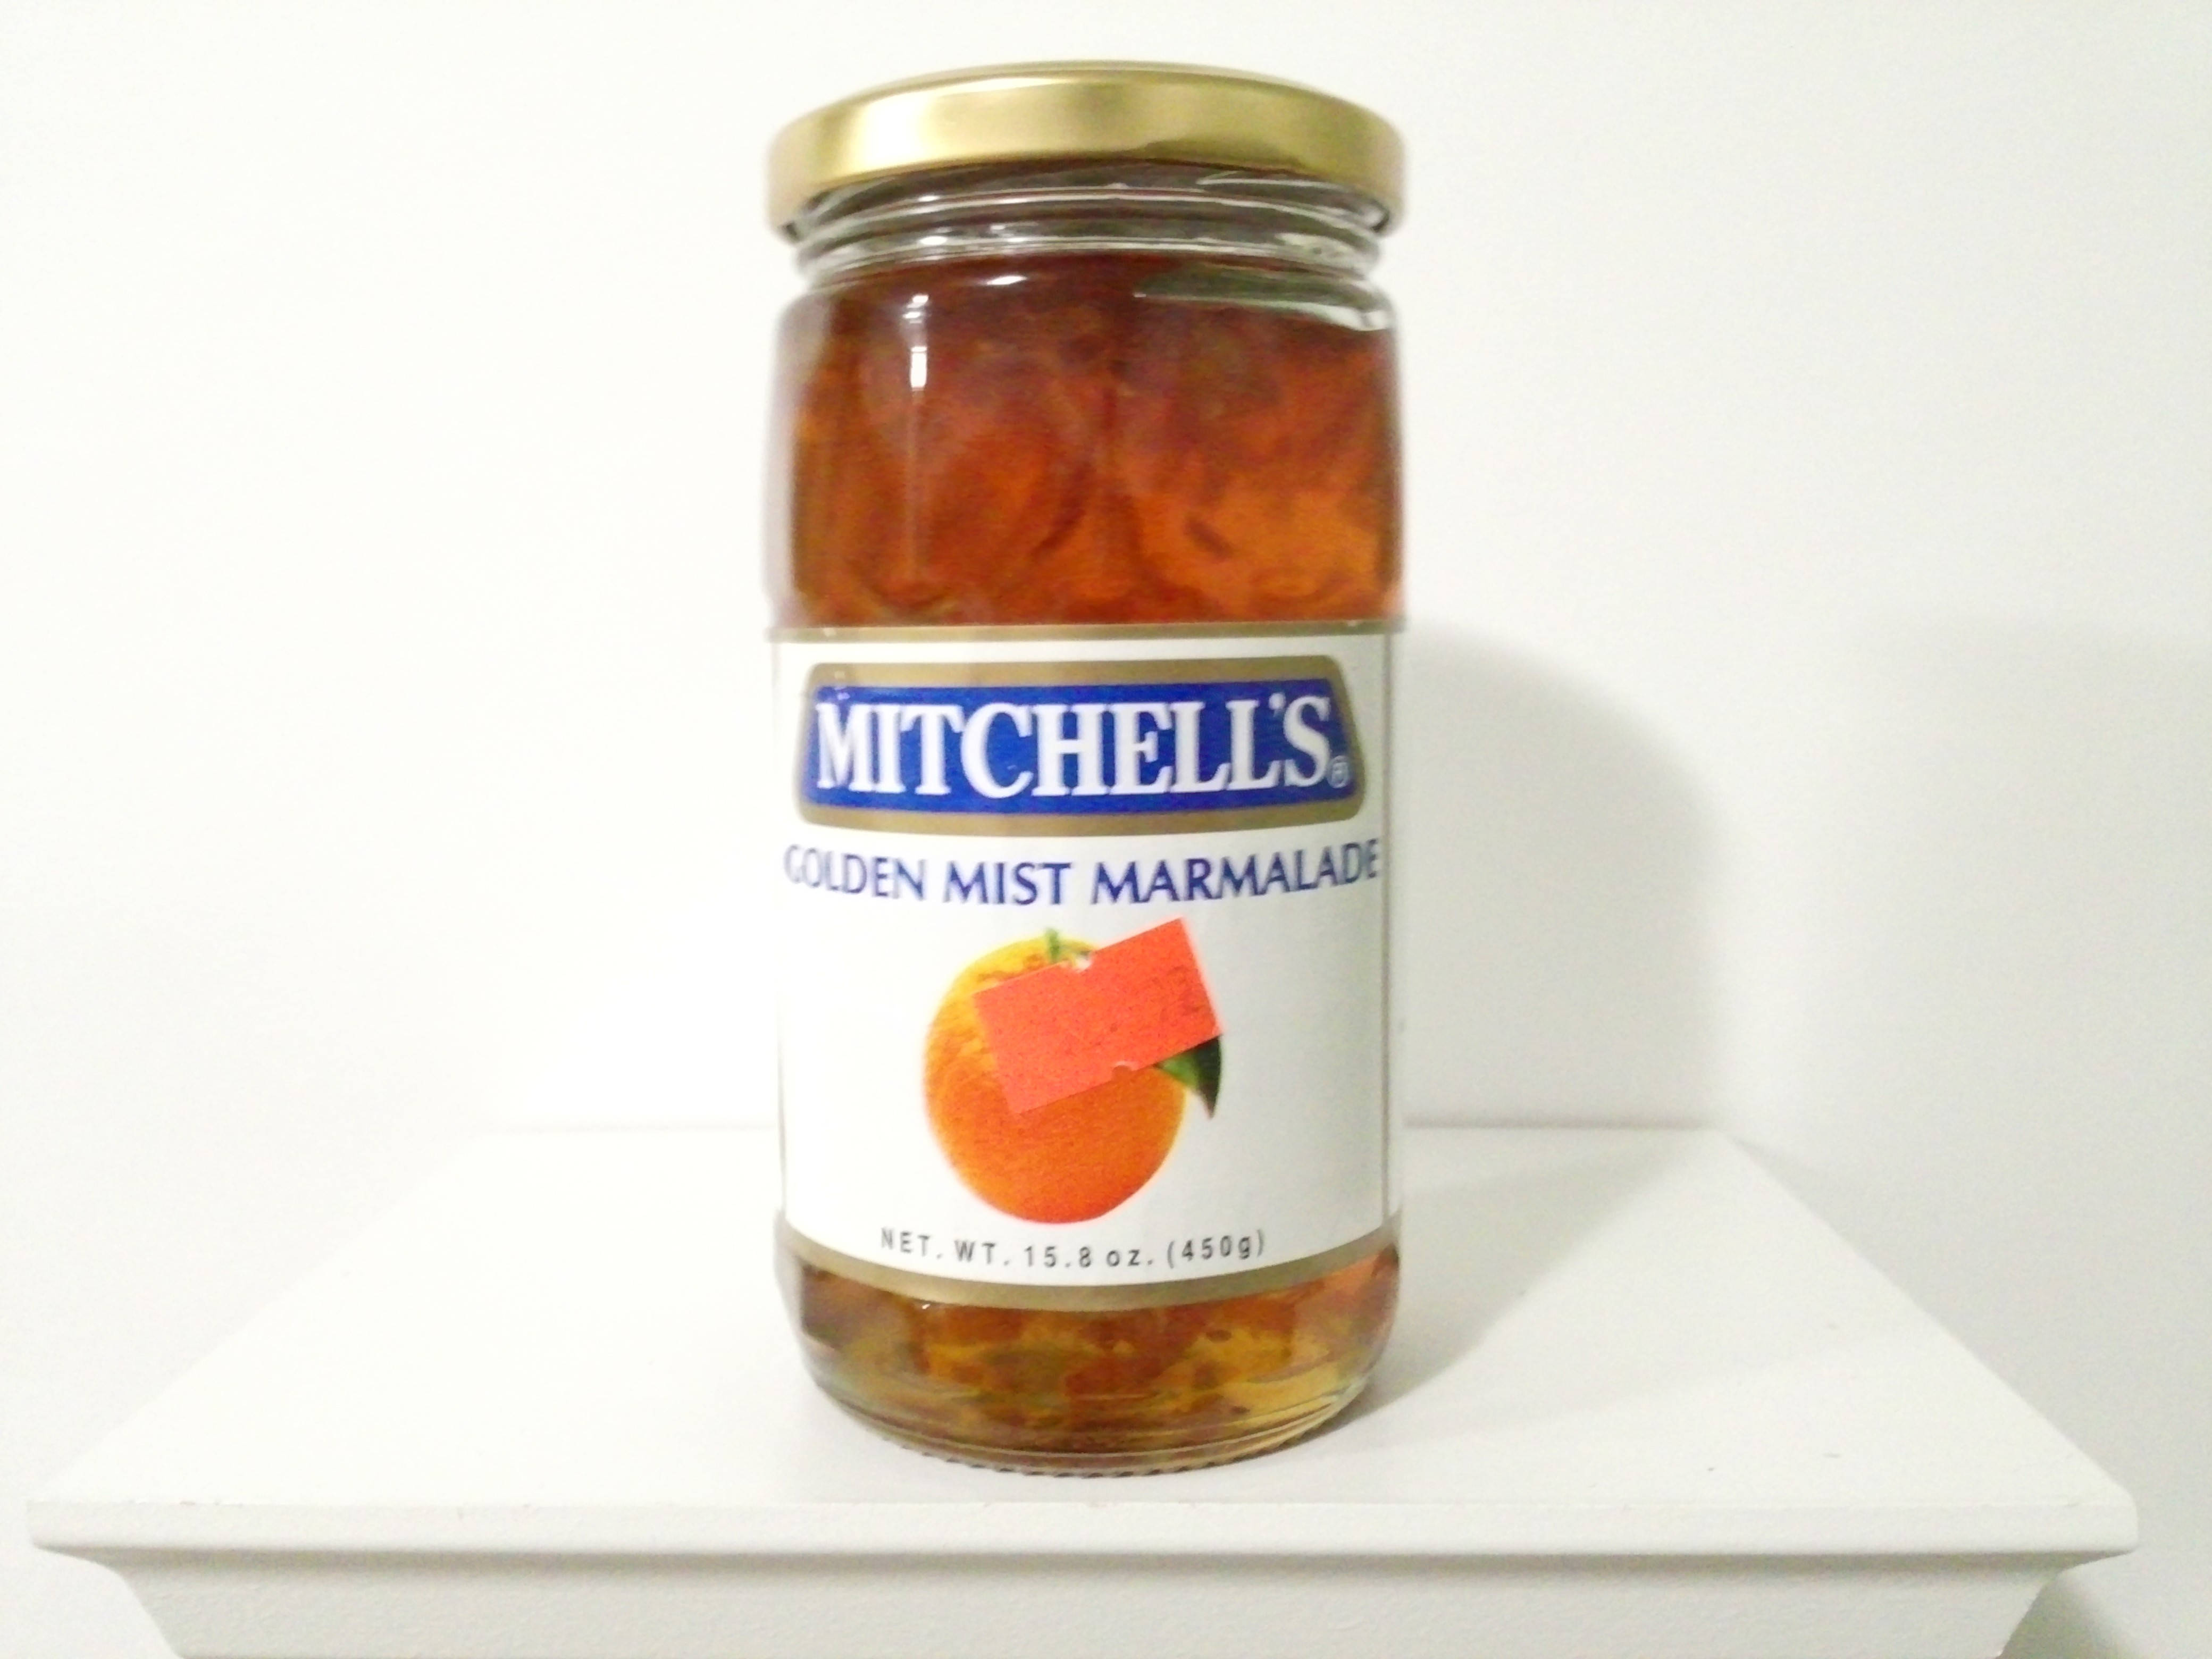 Mitchell's Golden Mist Marmalade Jam 450 grm